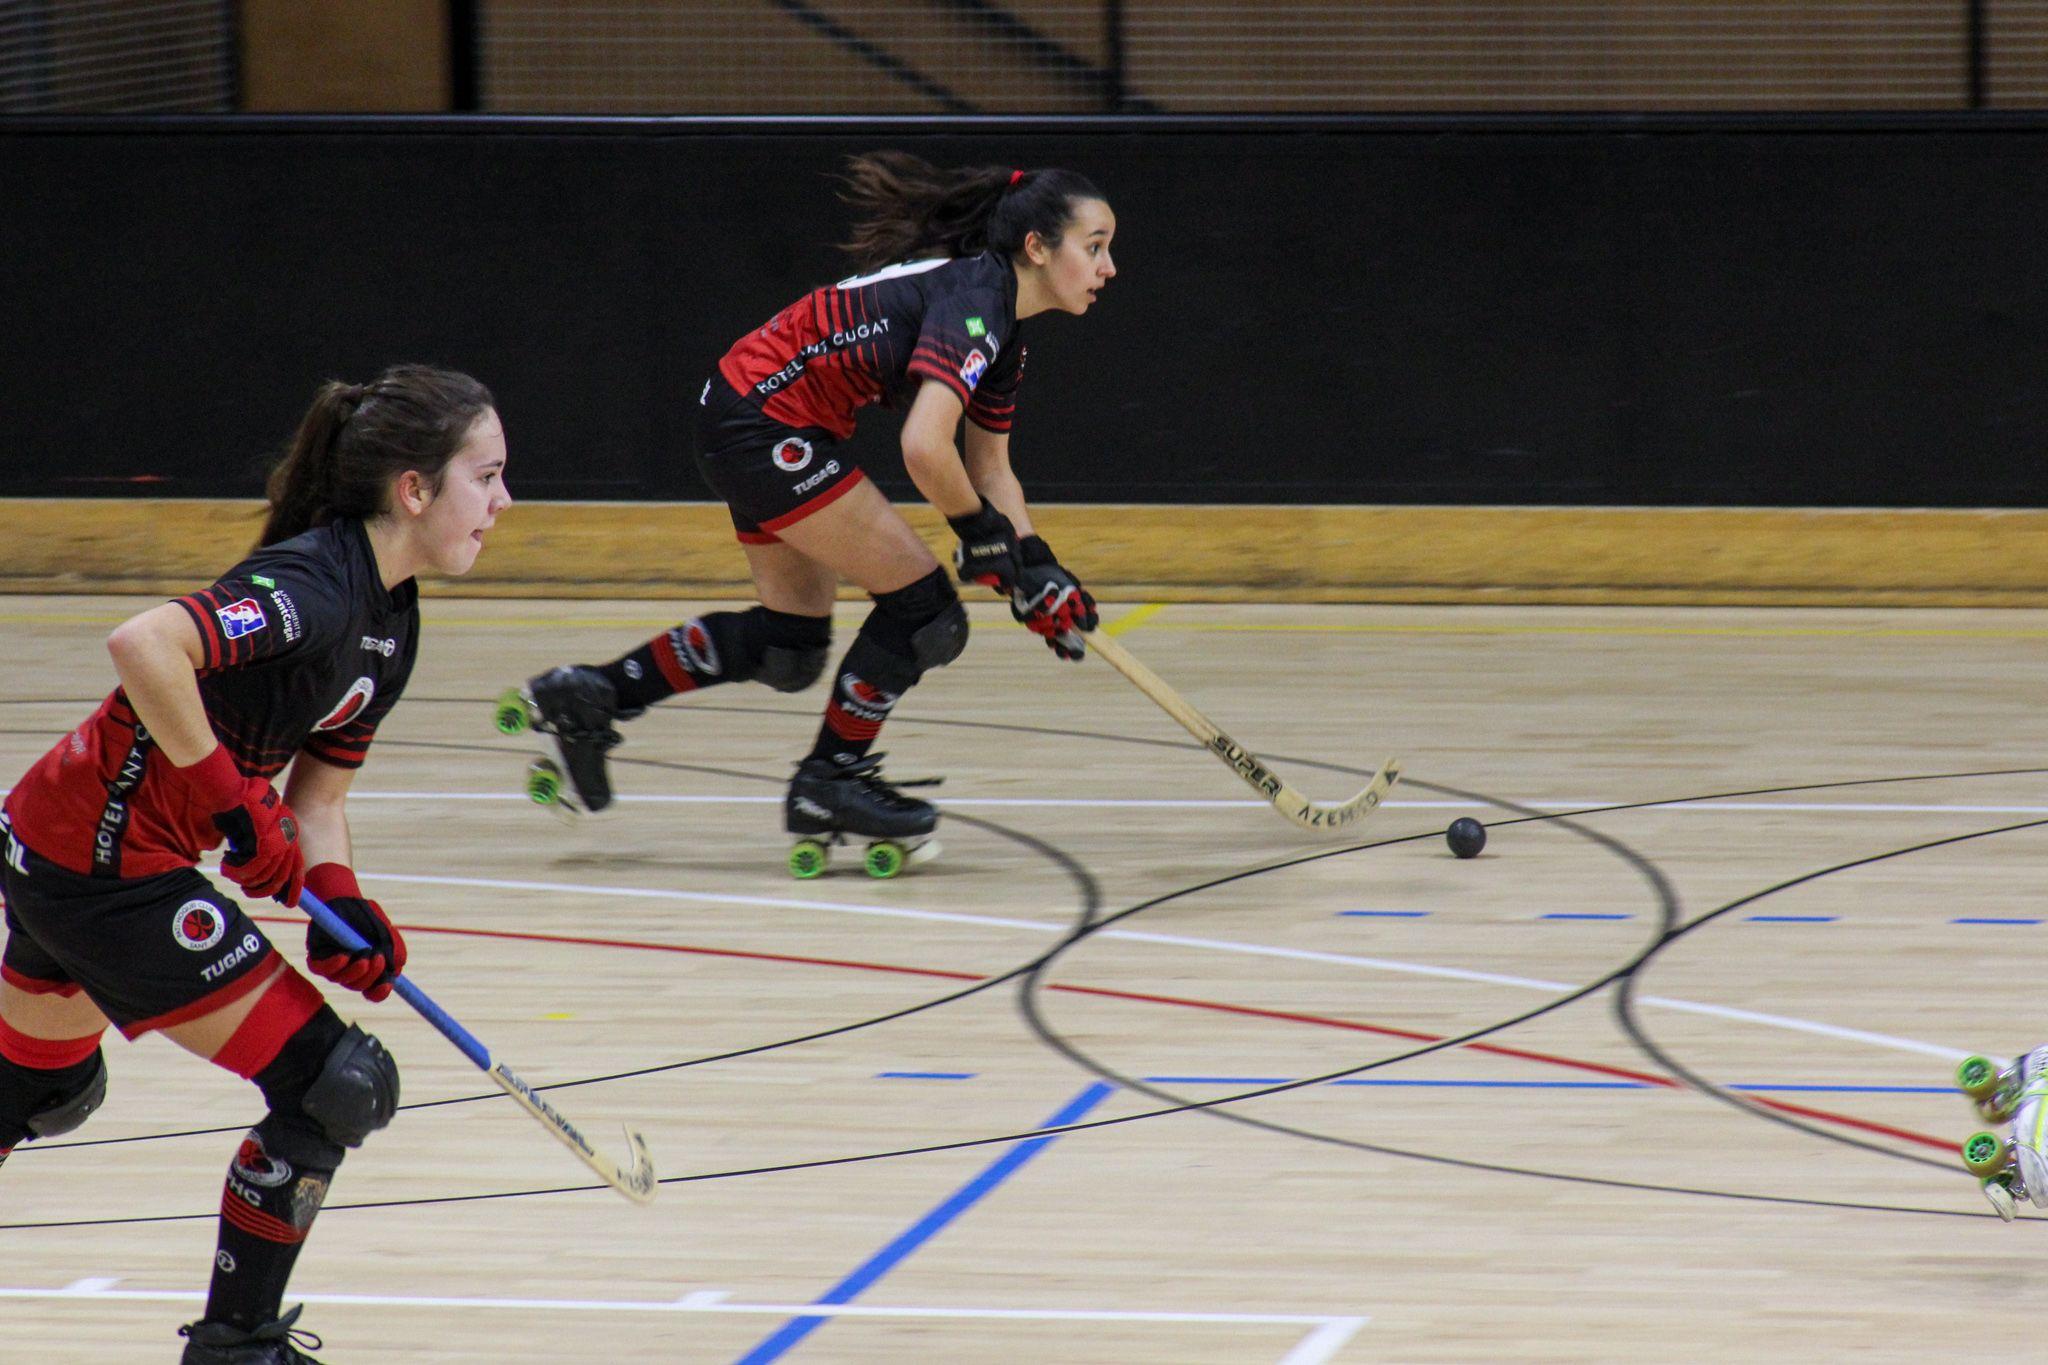 Lliga hoquei sobre patins femení. PHC Sant Cugat CP Vilanova. FOTO: Ale Gómez